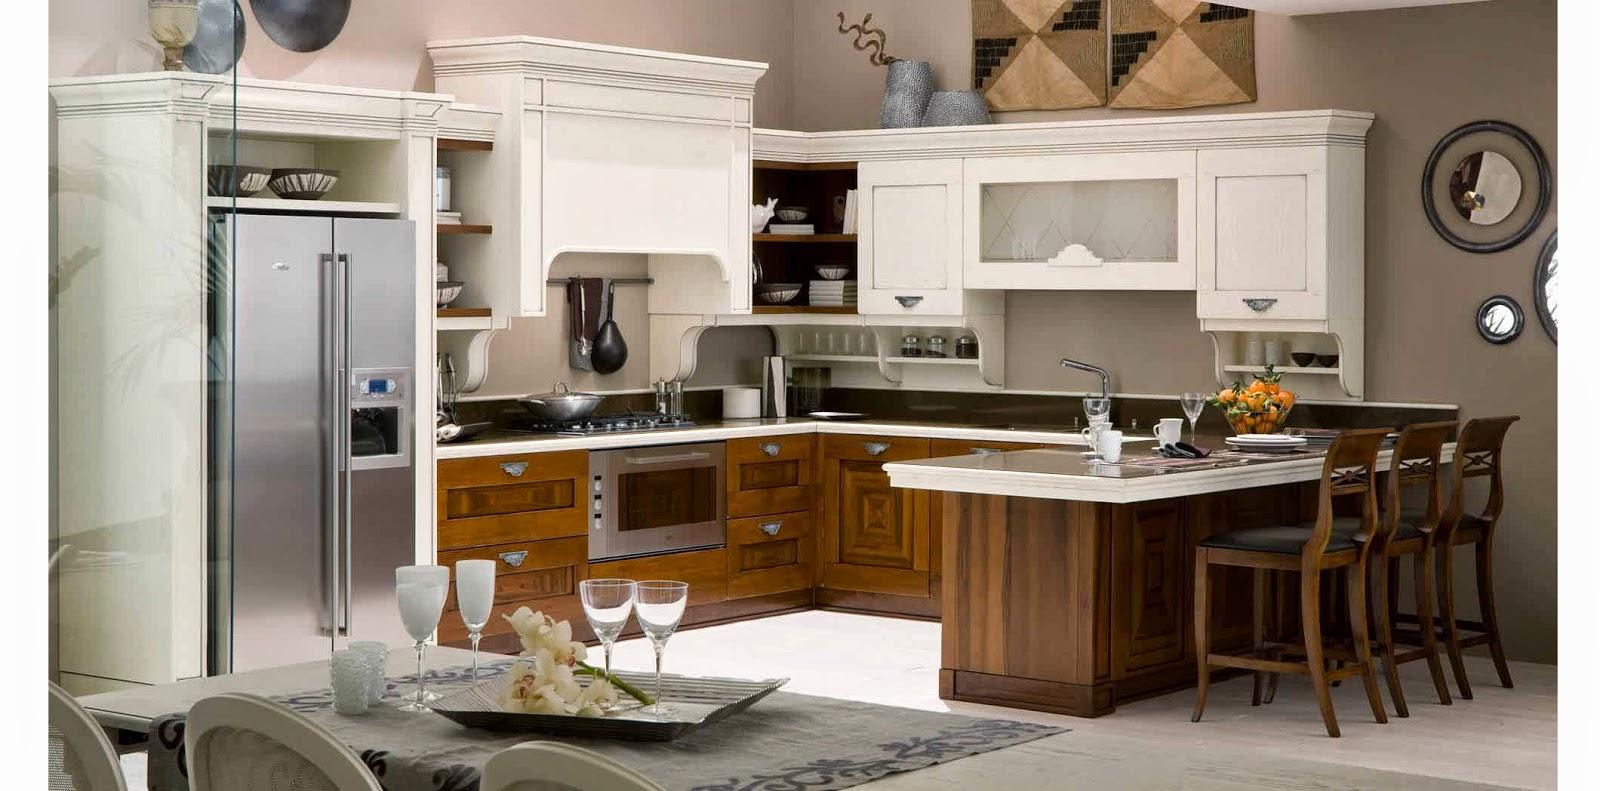 ... Models Of Minimalist Kitchens Make Your Kitchen Look Organized ...